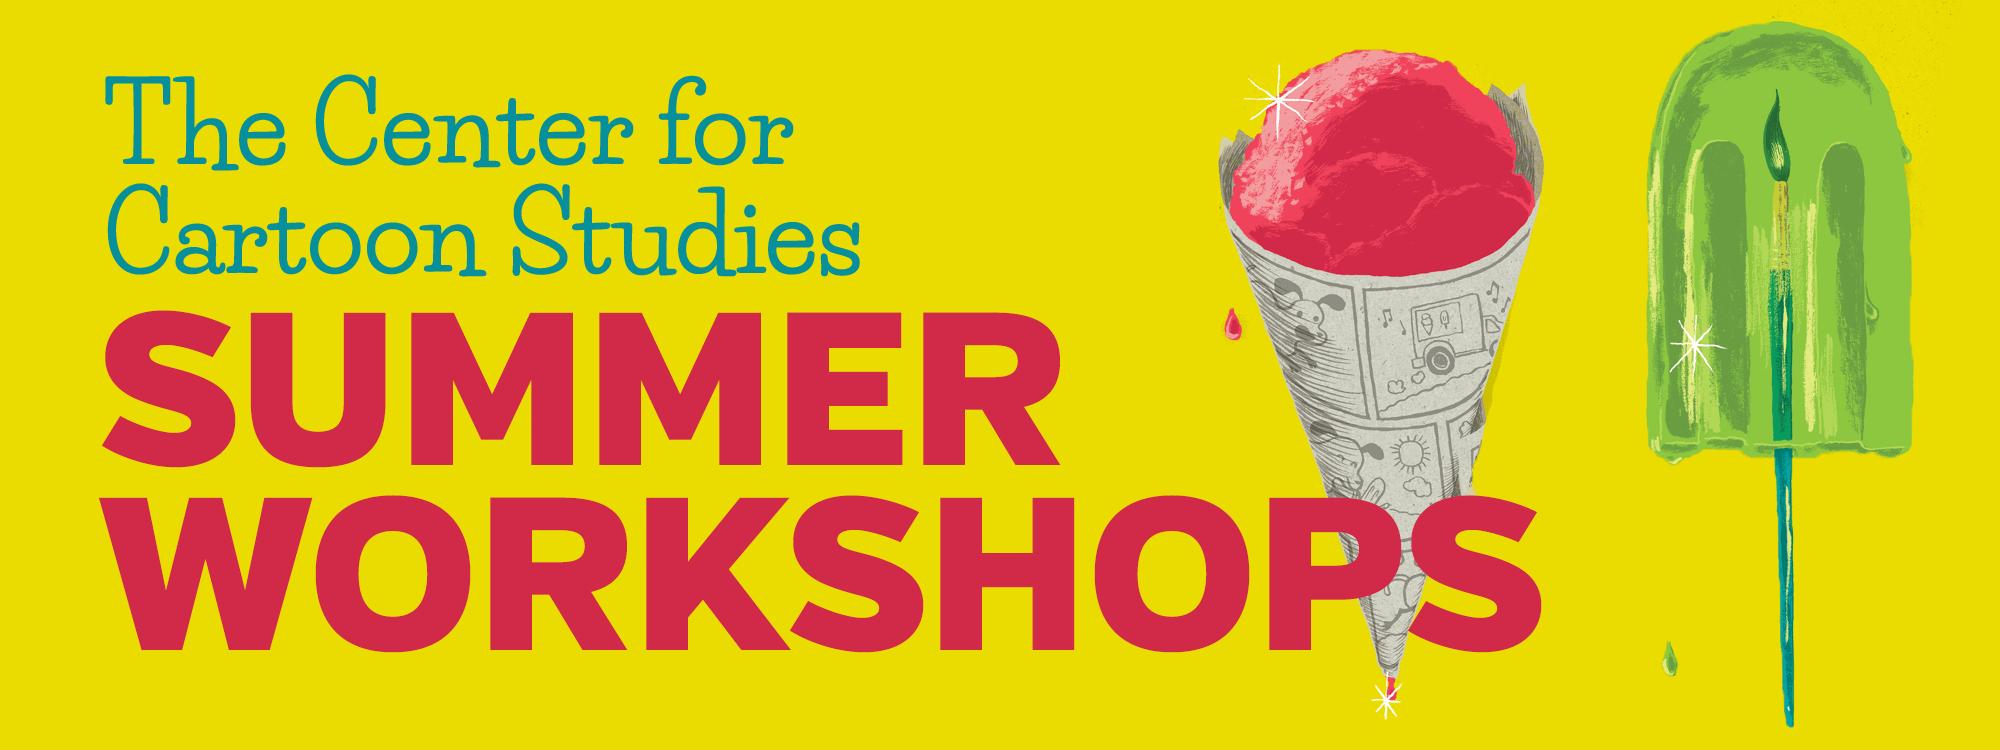 Cartooning Summer Workshops   The Center for Cartoon Studies The